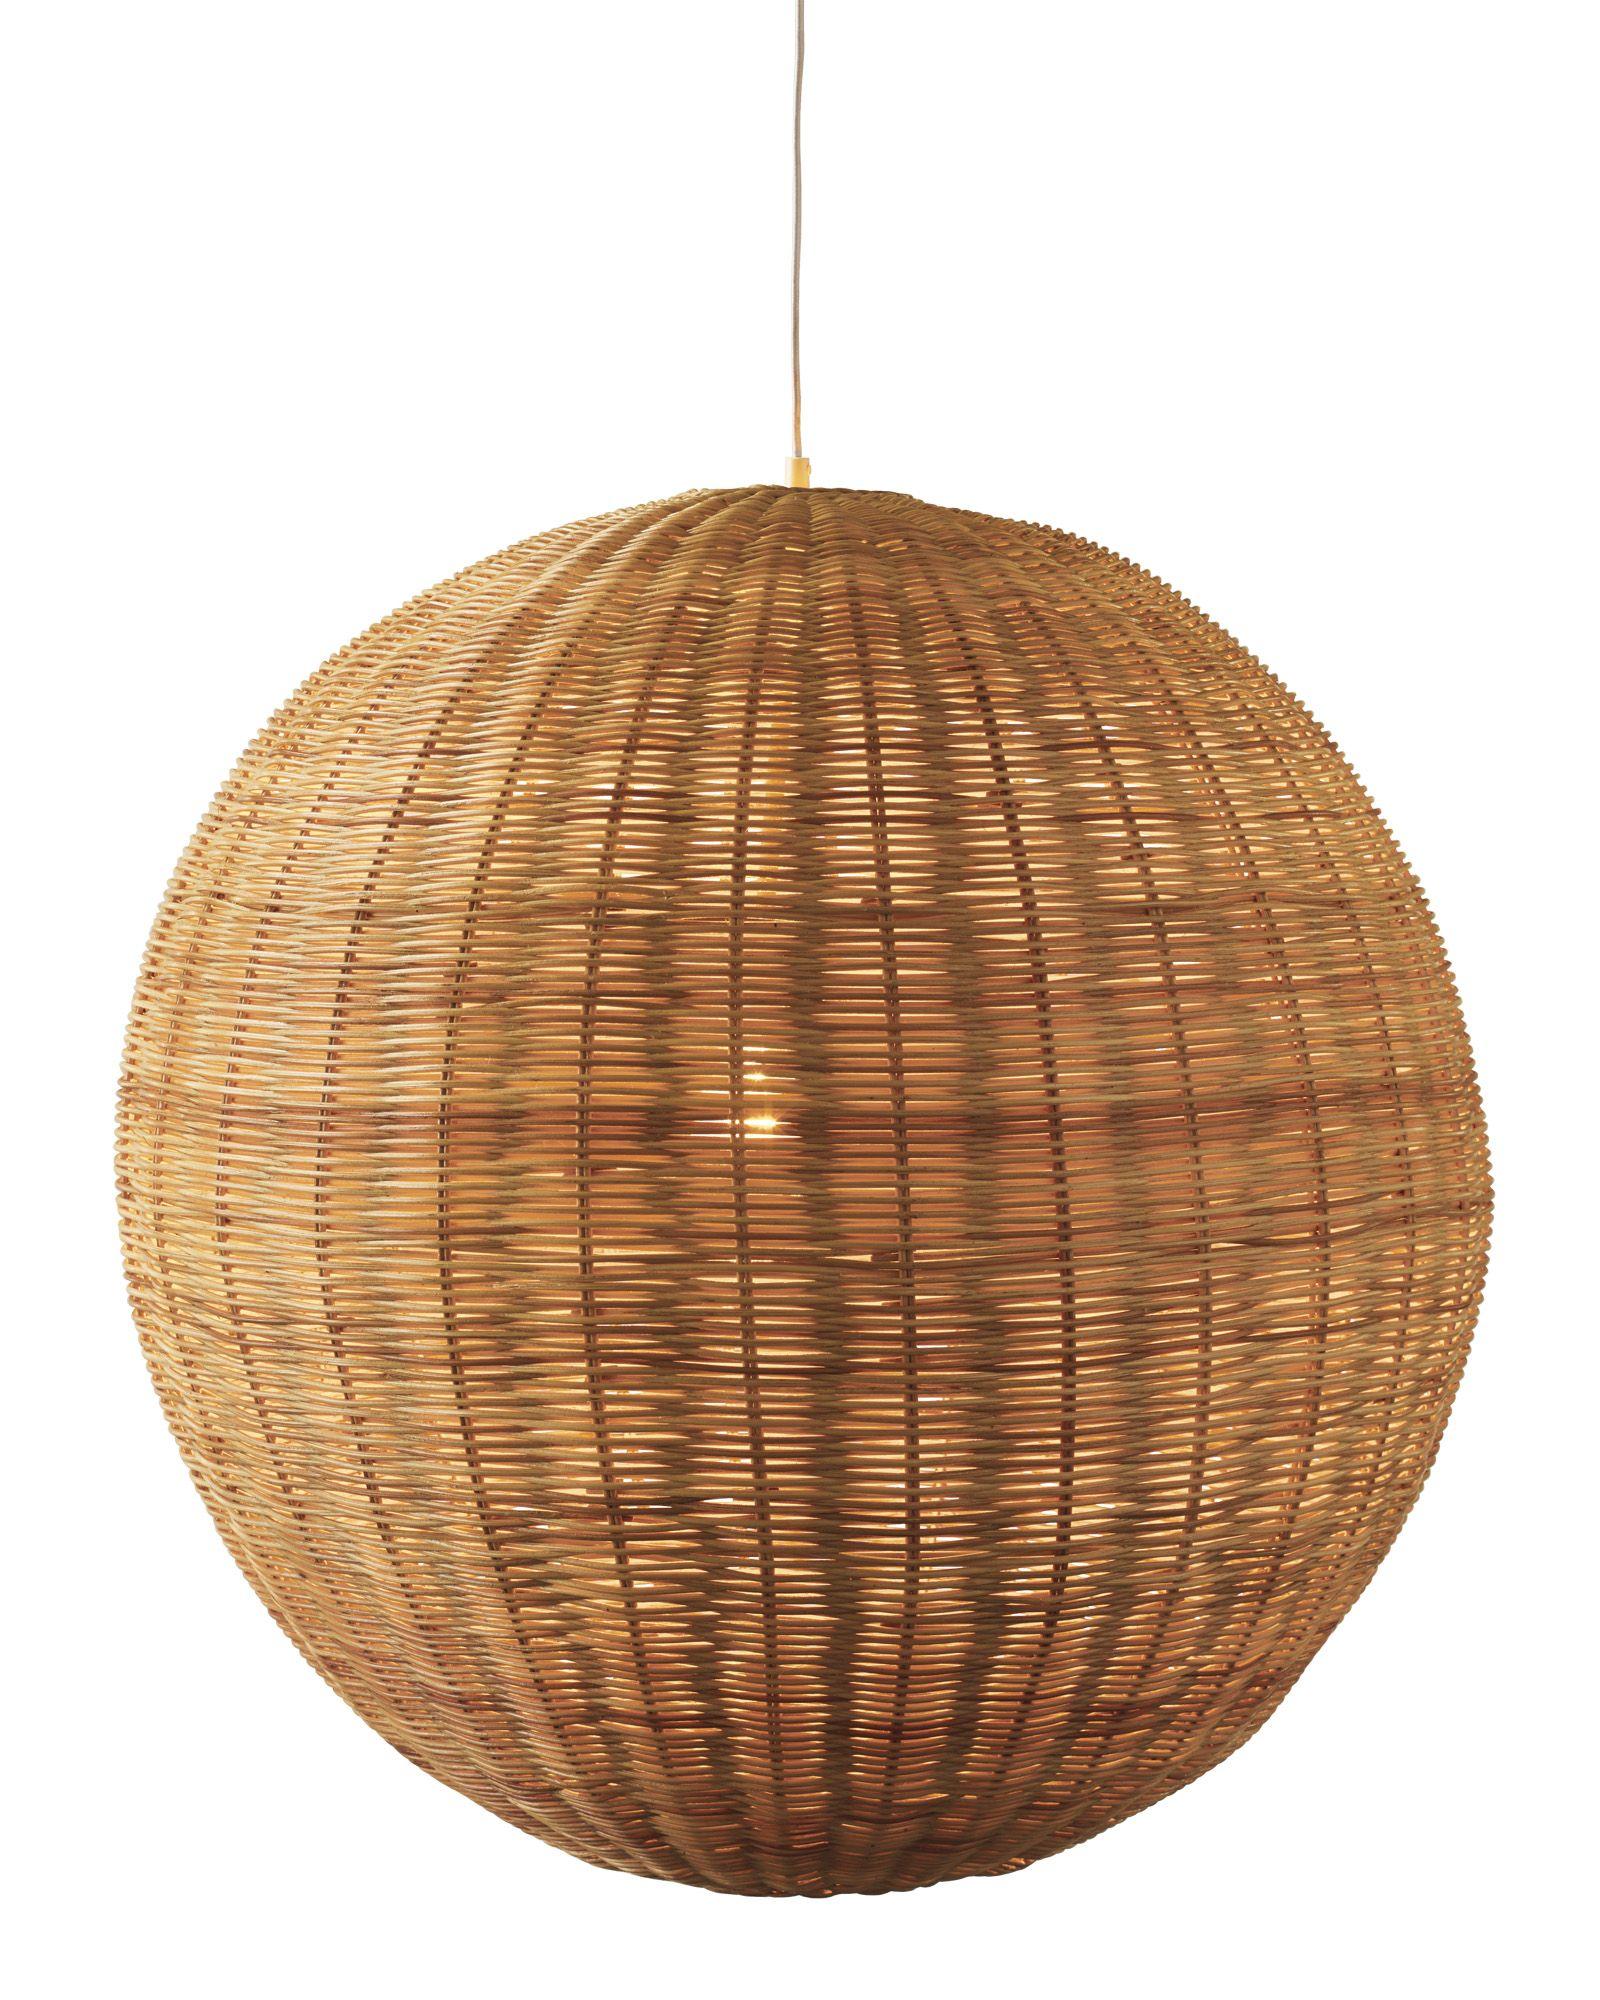 Hermosa pendanthermosa pendant bedroom decor lights bedroom lighting pendant chandelier cottage living rooms